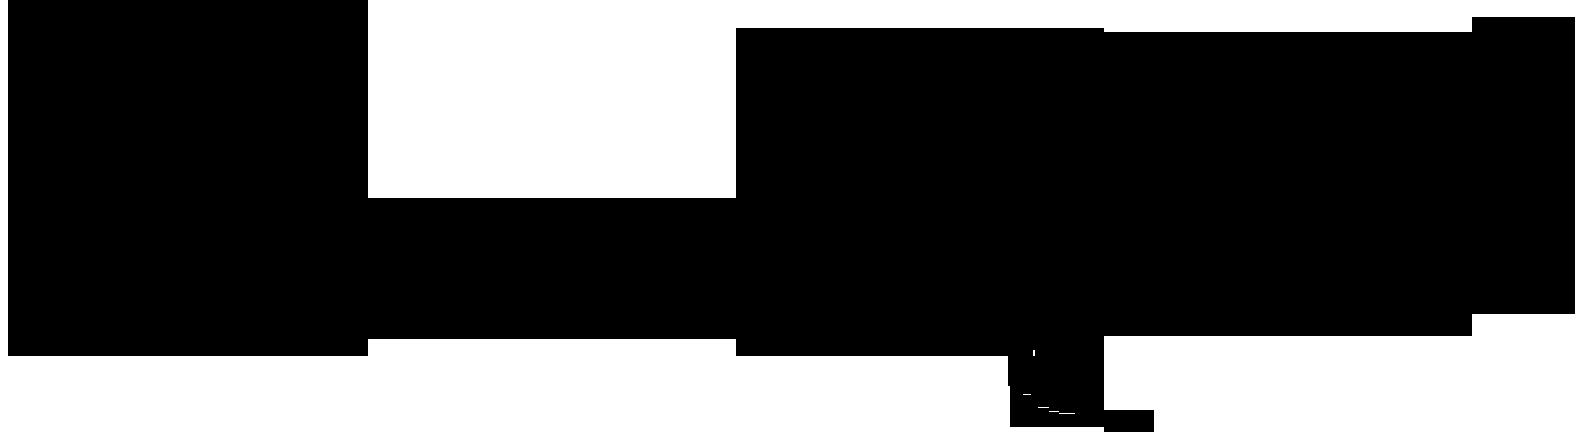 C Hummel Kornell's Signature